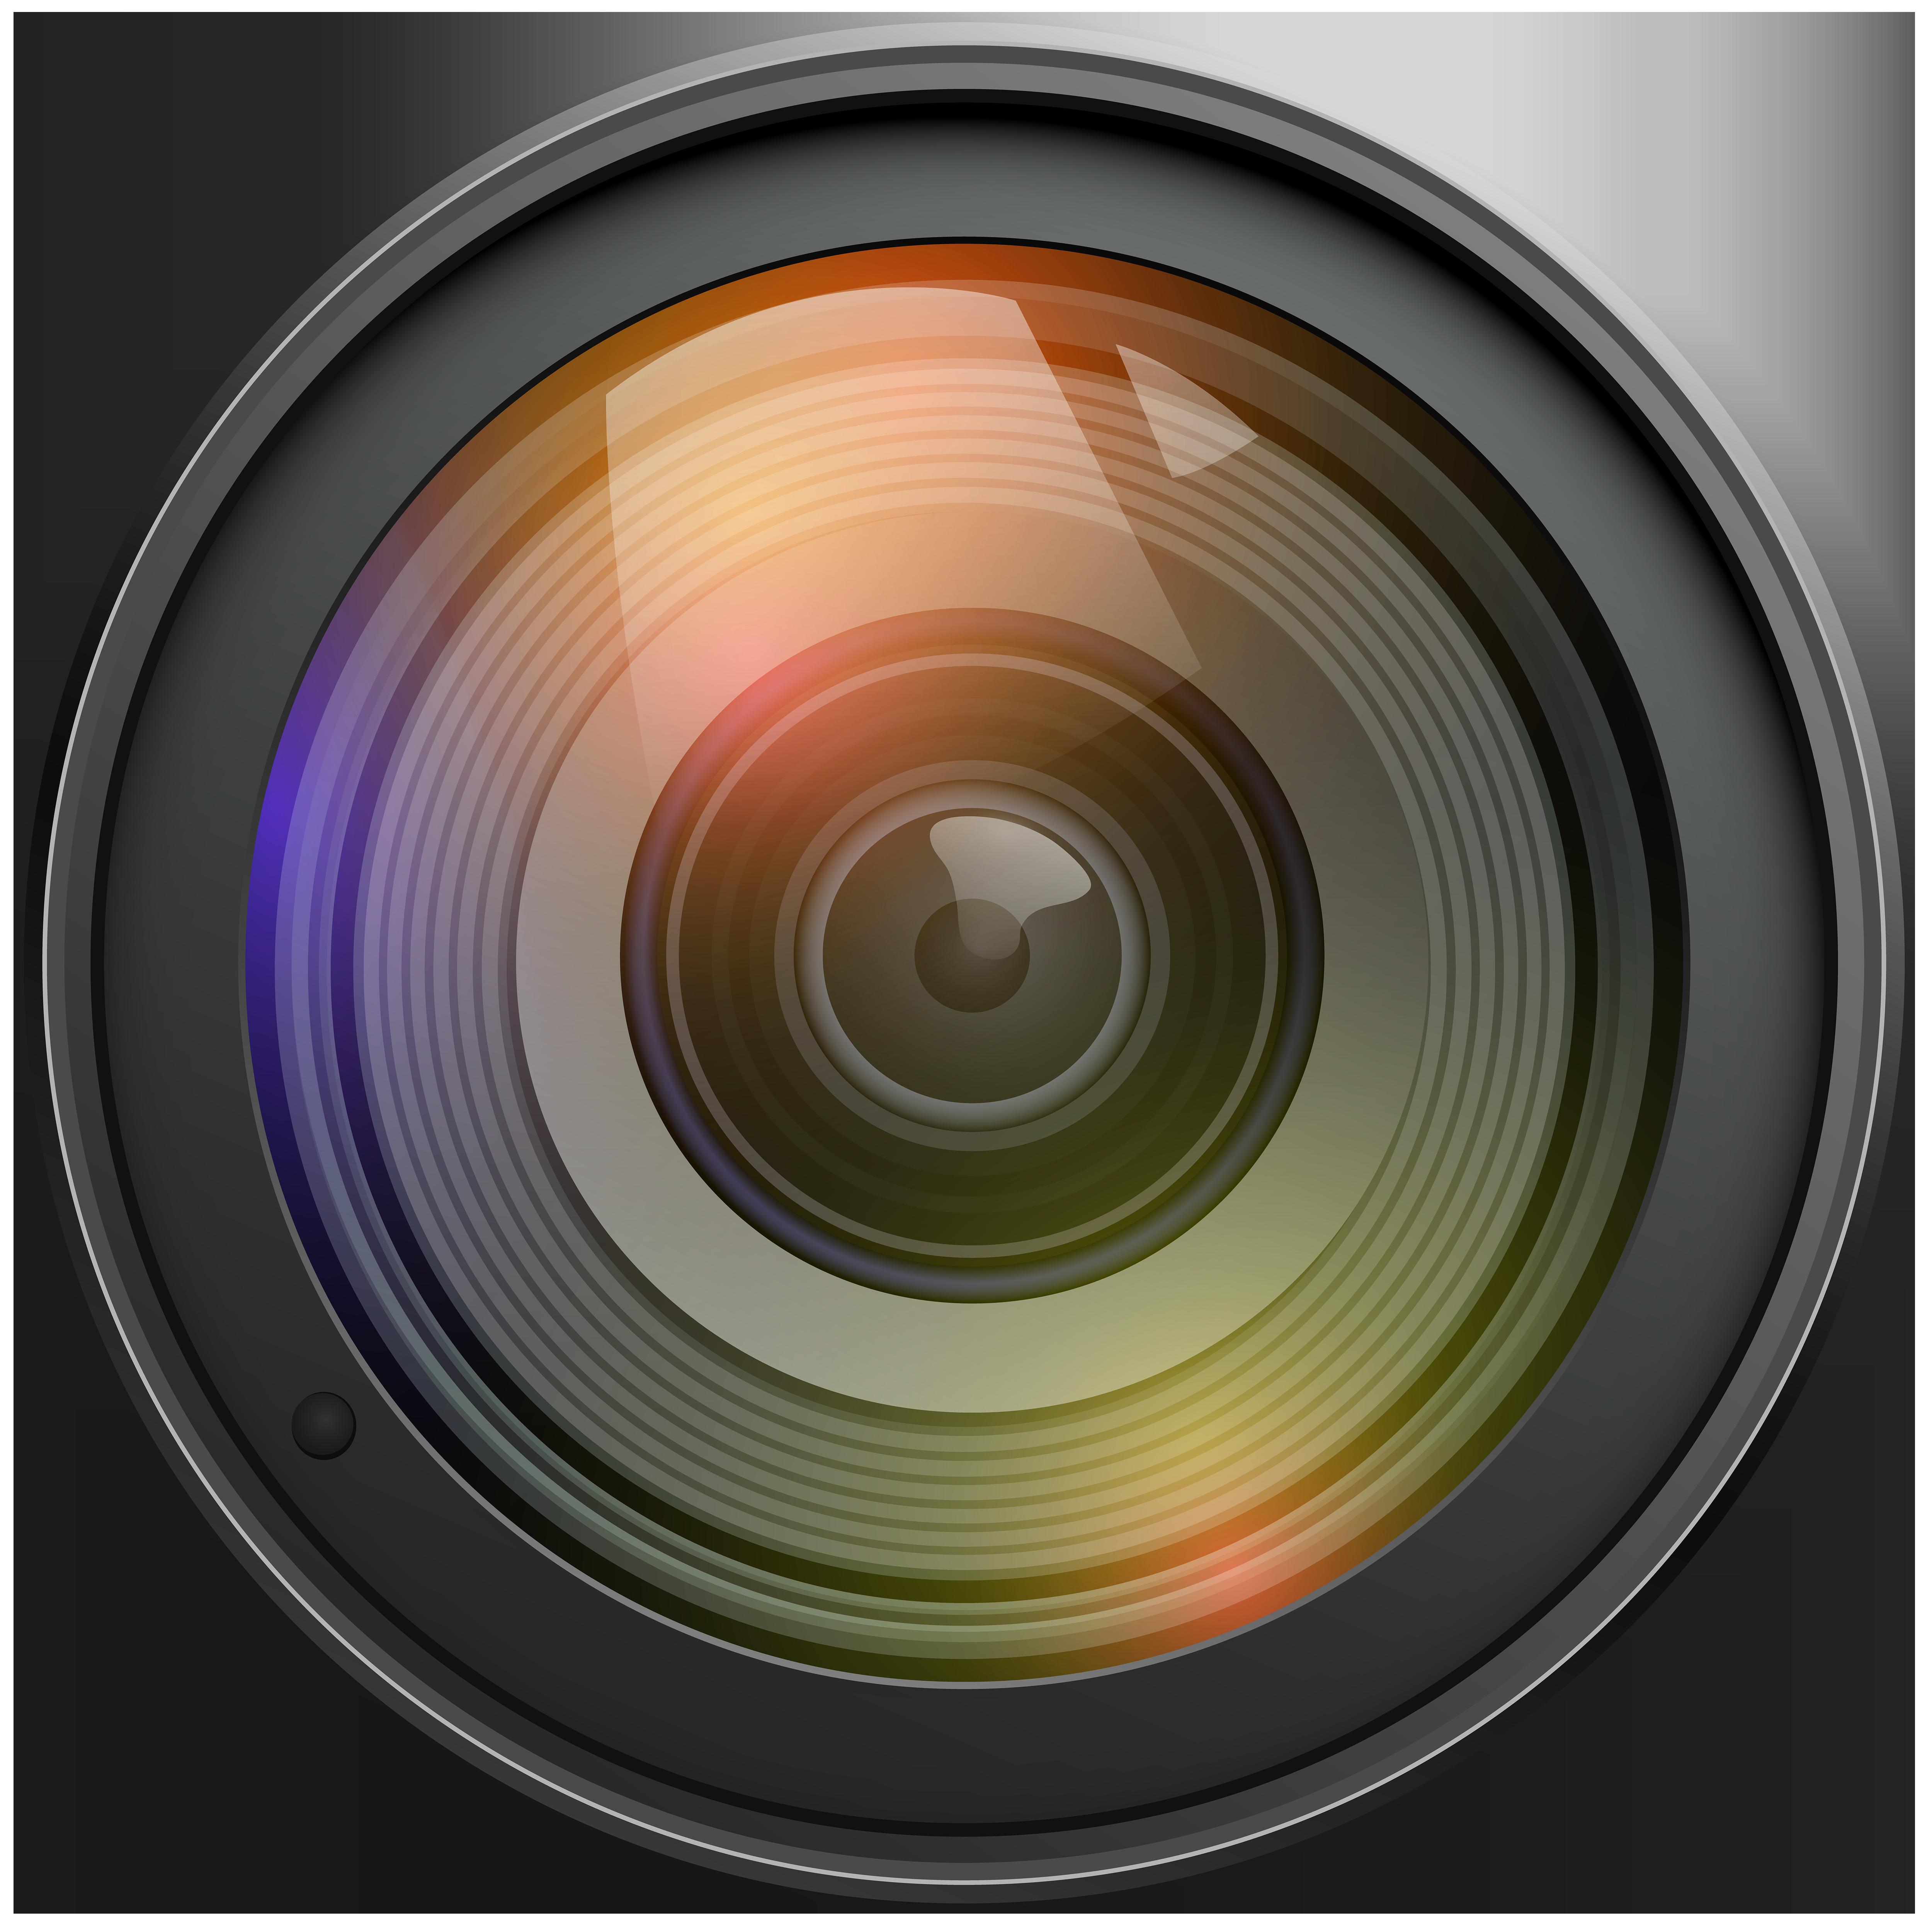 png transparent stock Lens clipart. Transparent png clip art.